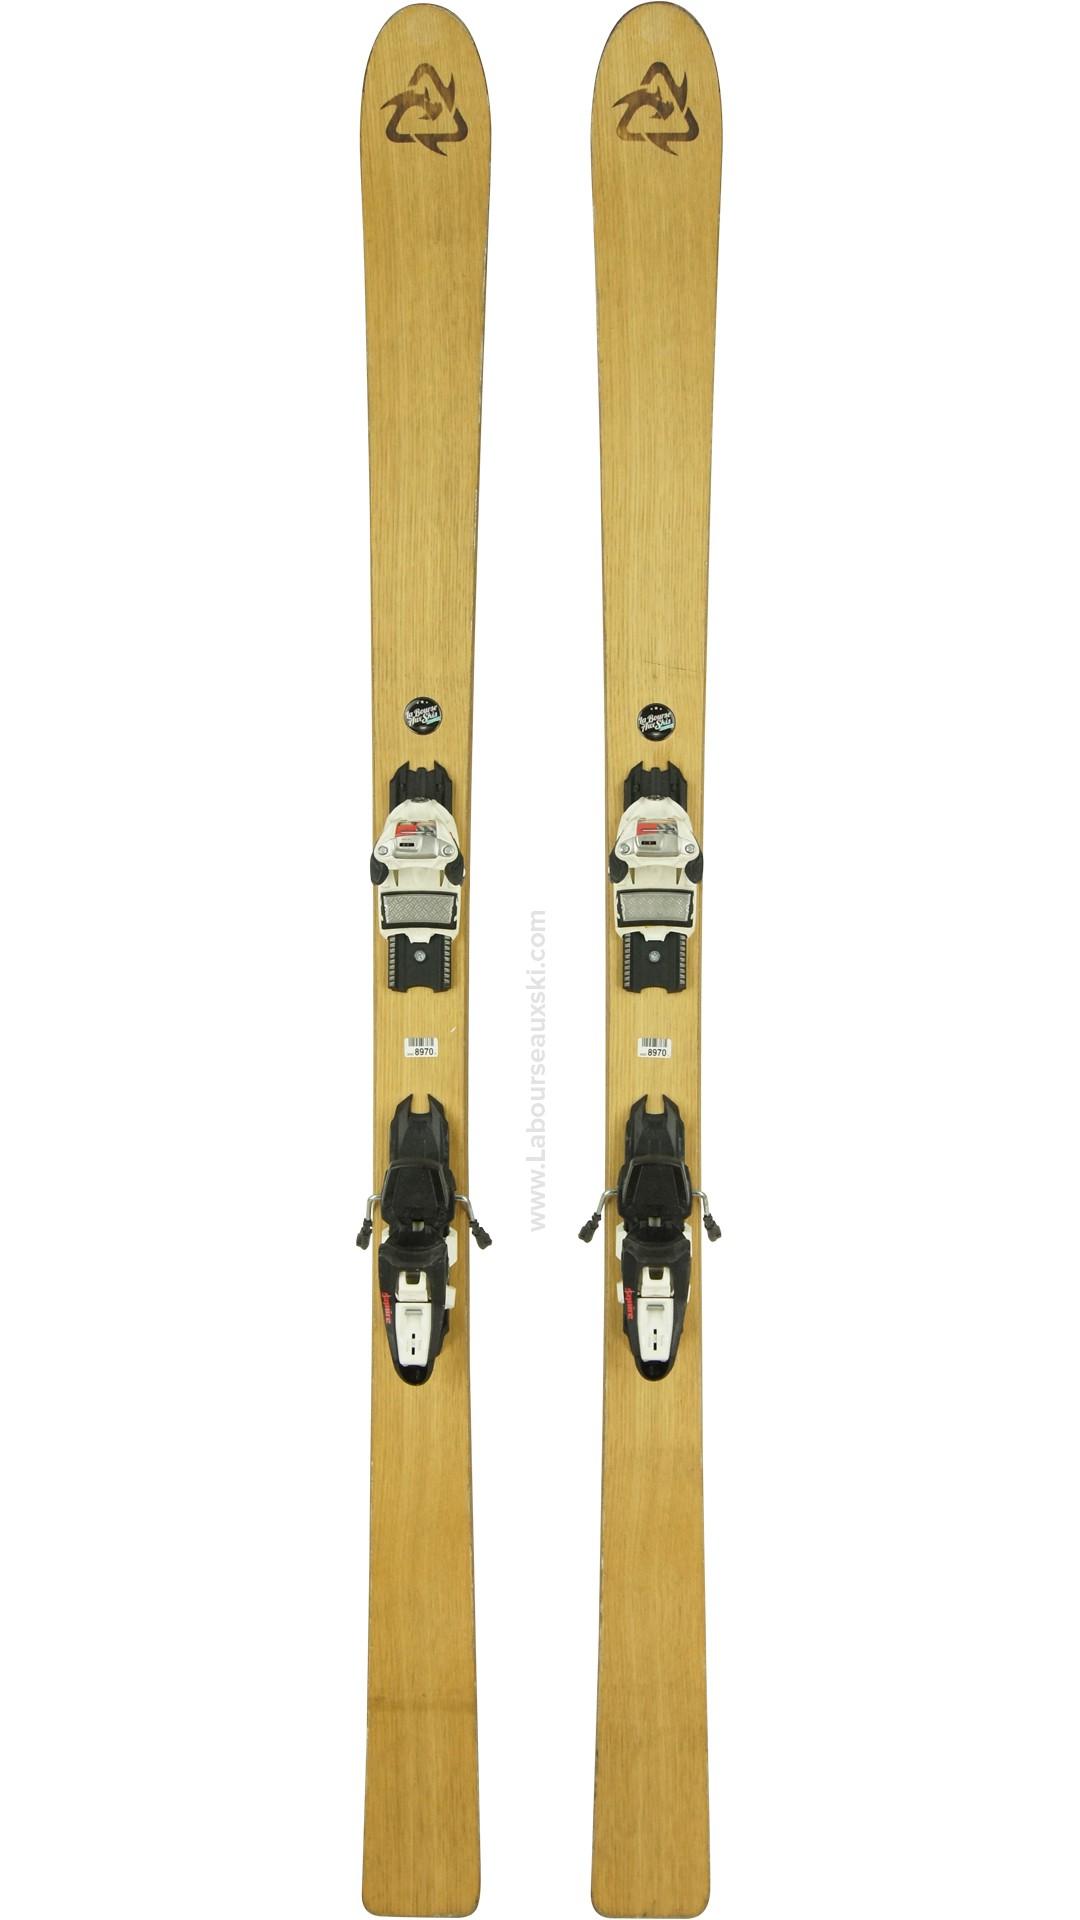 ski occasion idris chamois skis d 39 occasion. Black Bedroom Furniture Sets. Home Design Ideas